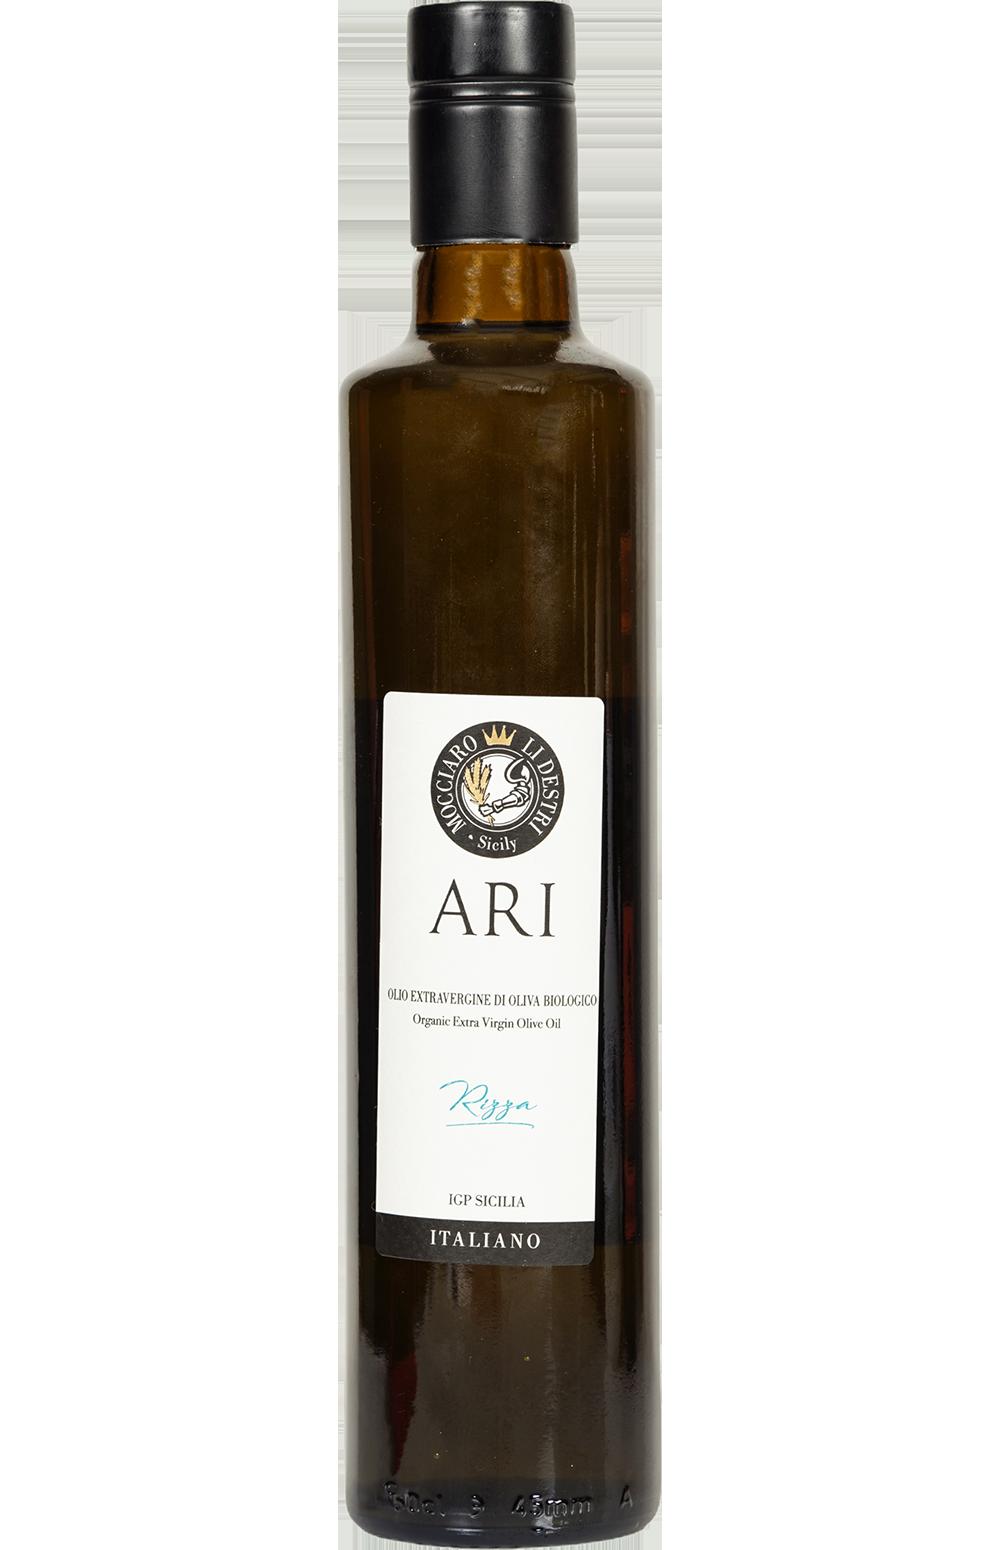 Ari Rizza Organic